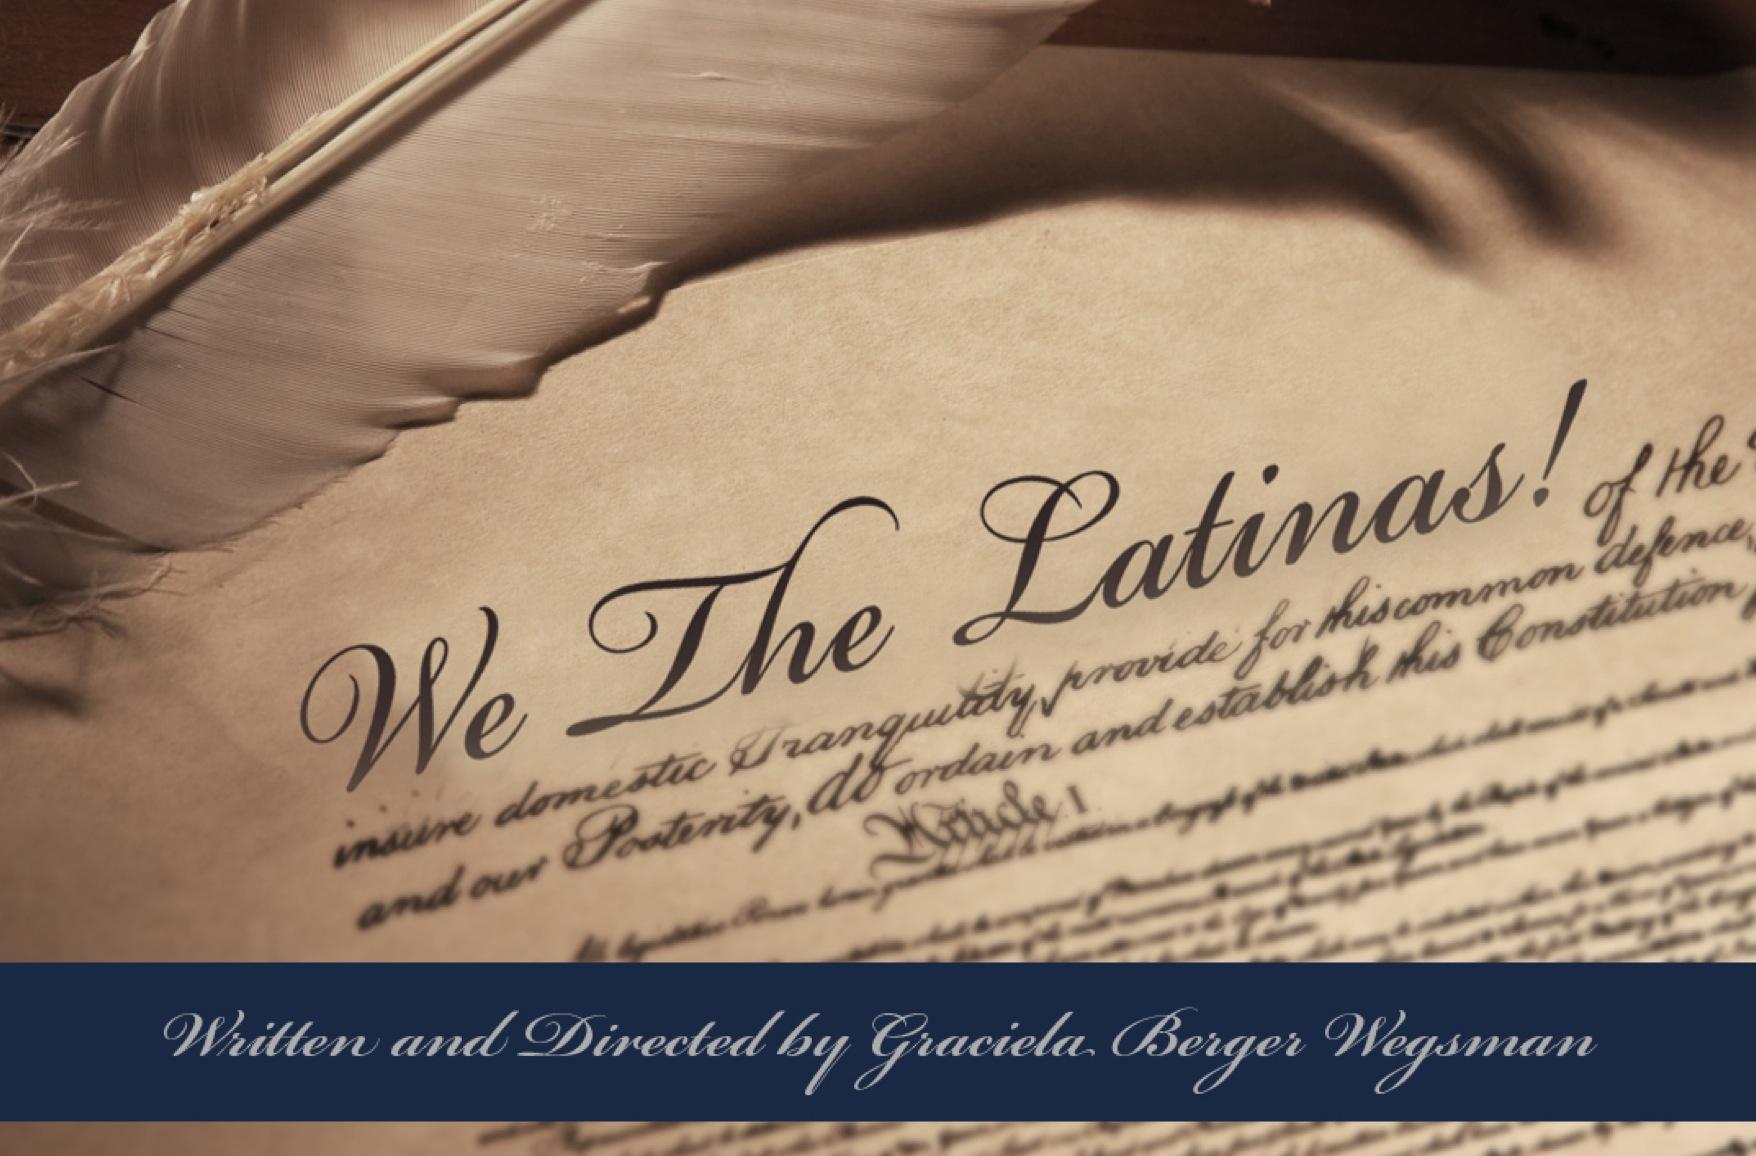 we the latinas-Logo.jpg